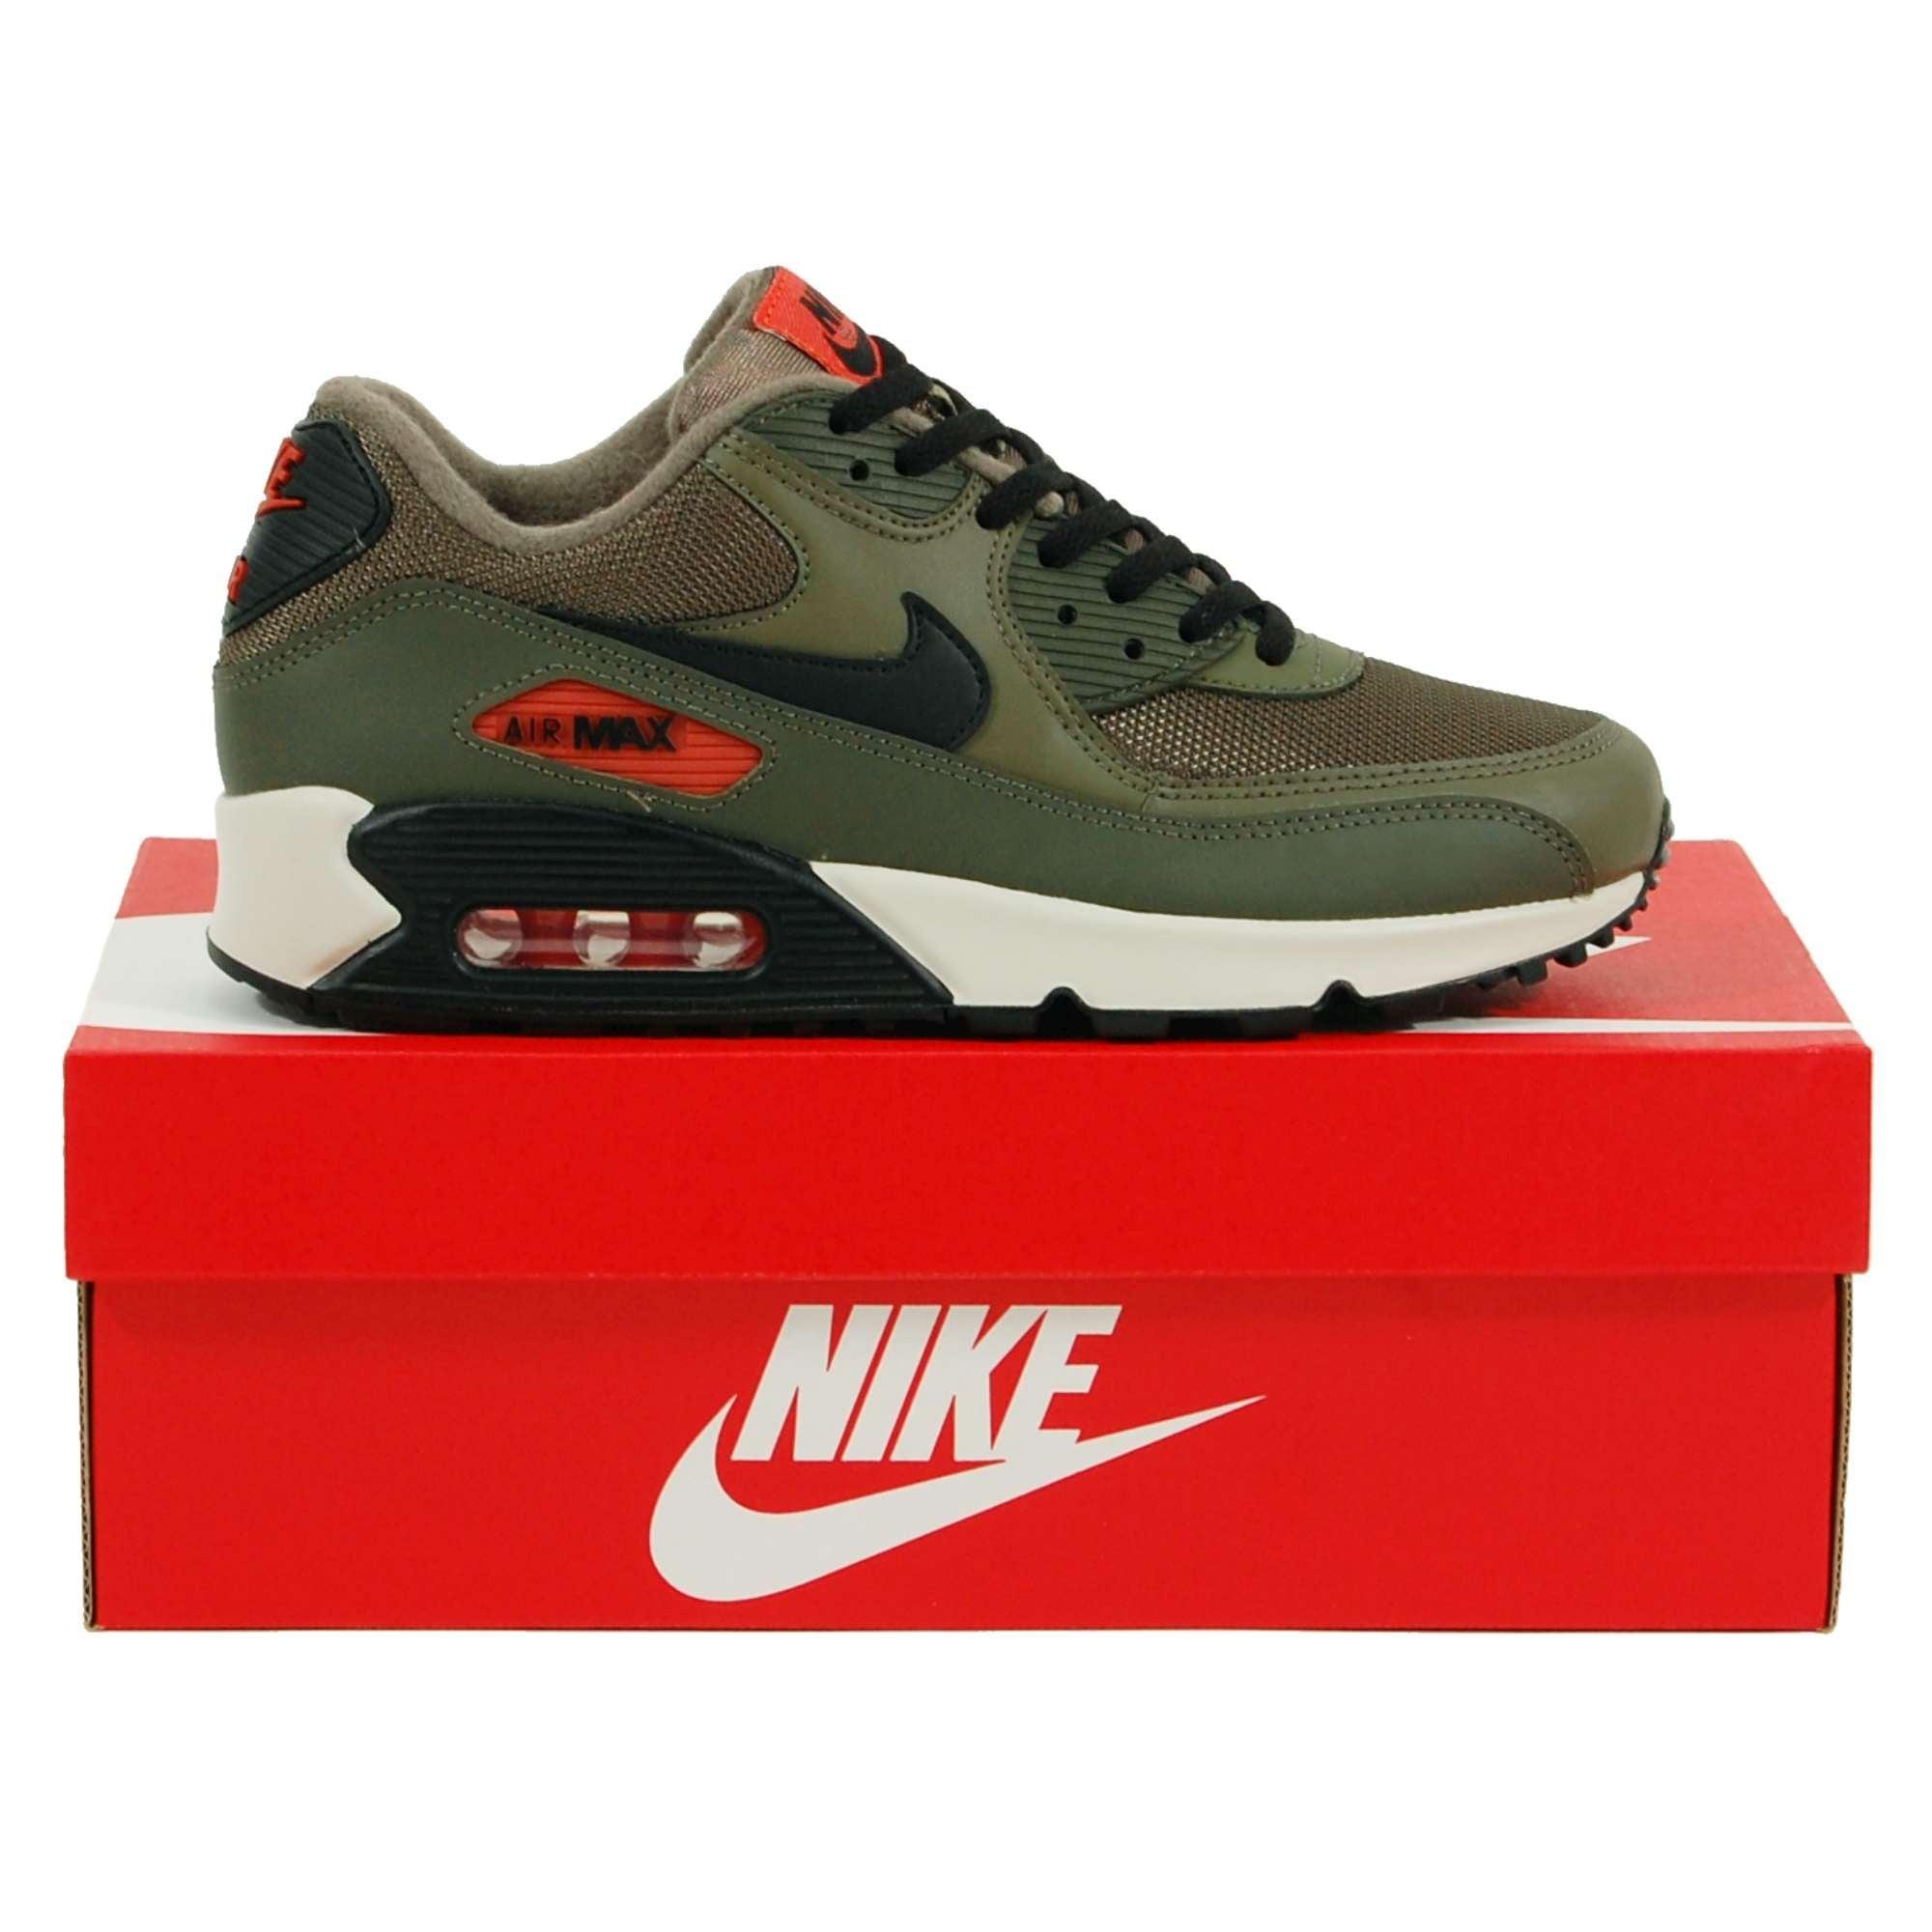 Nike Sportswear Shoes Air Max 90 Essential Medium Olive